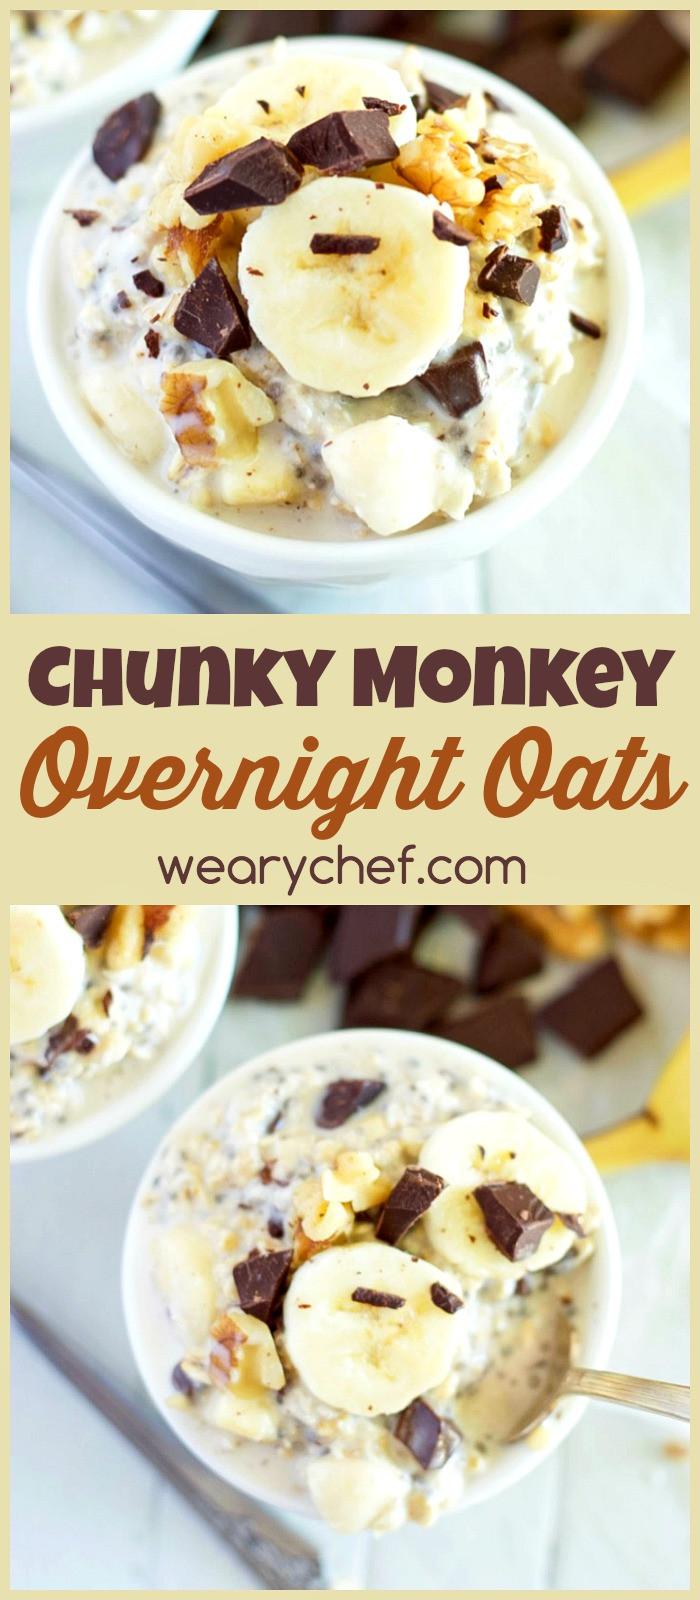 Oatmeal Recipe For Breakfast  Chunky Monkey Overnight Oats Recipe The Weary Chef